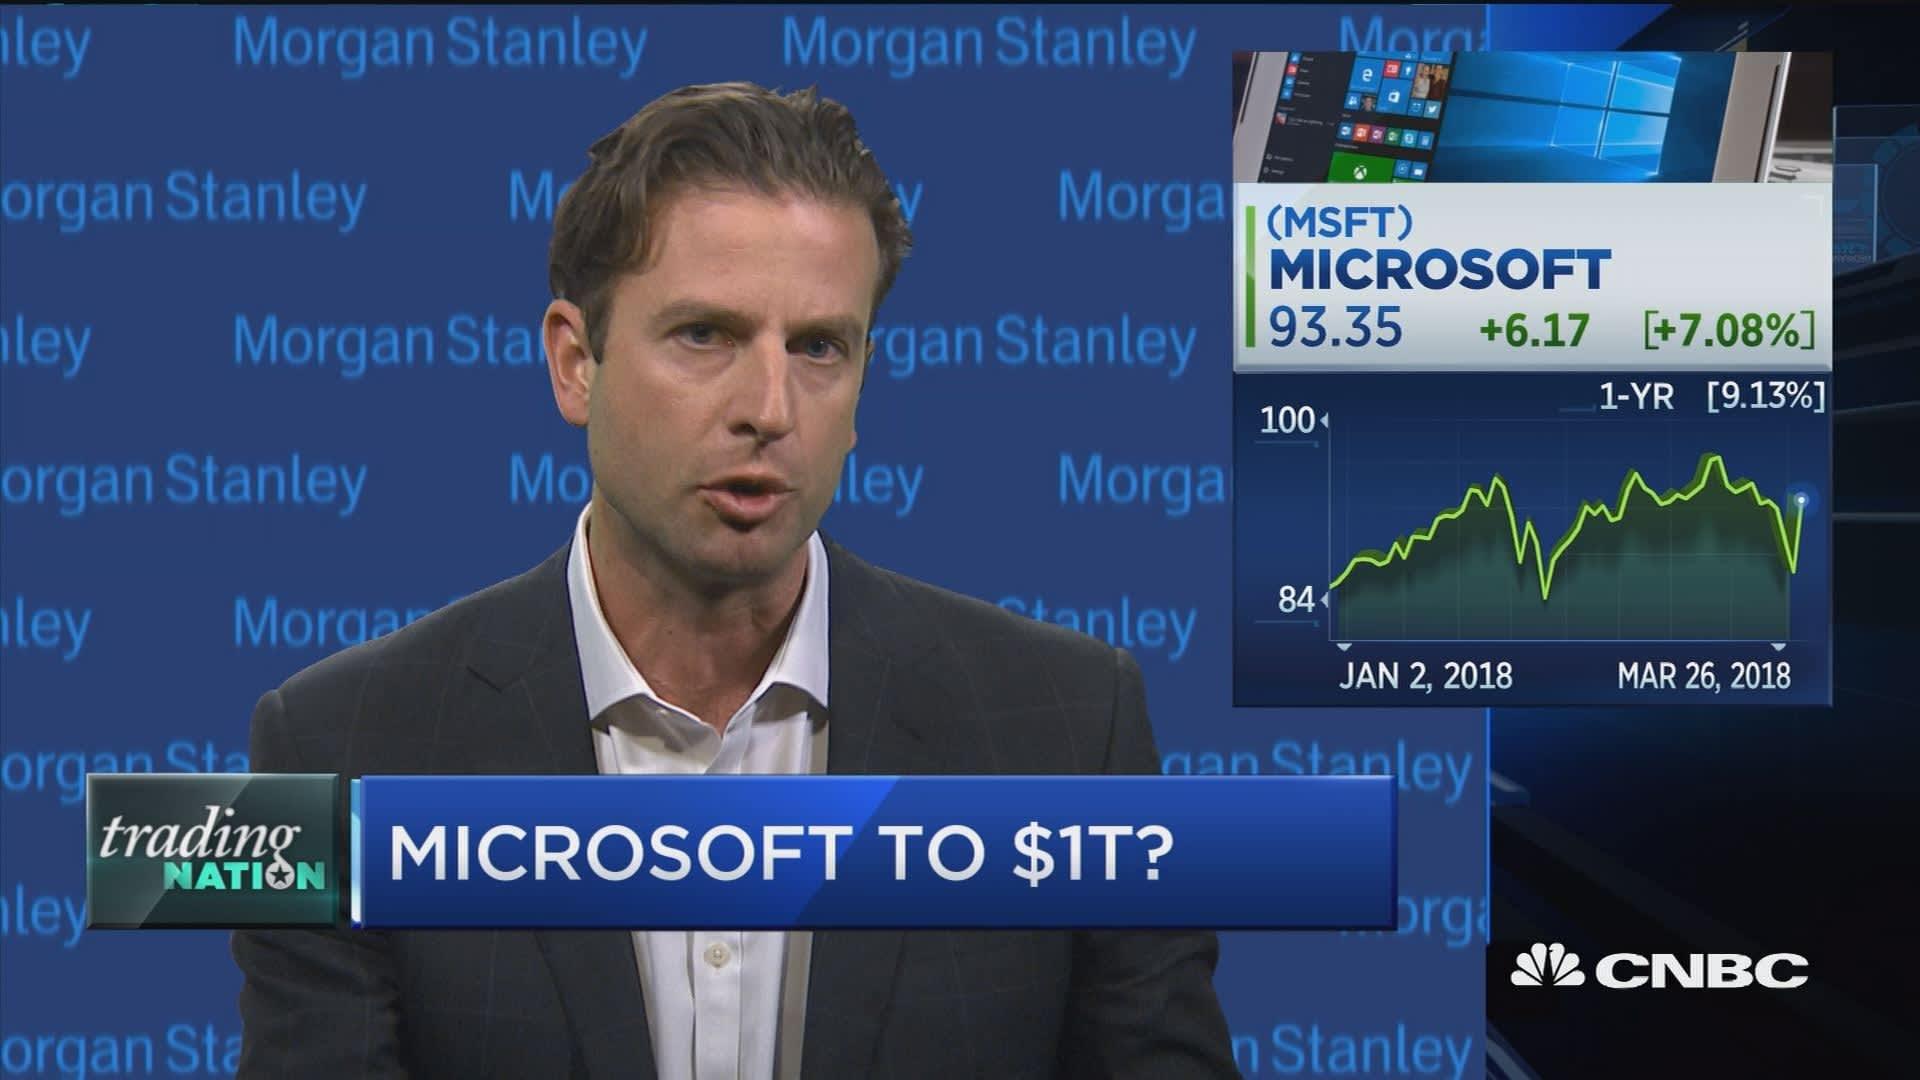 Trading Nation: Microsoft to $1 trillion?